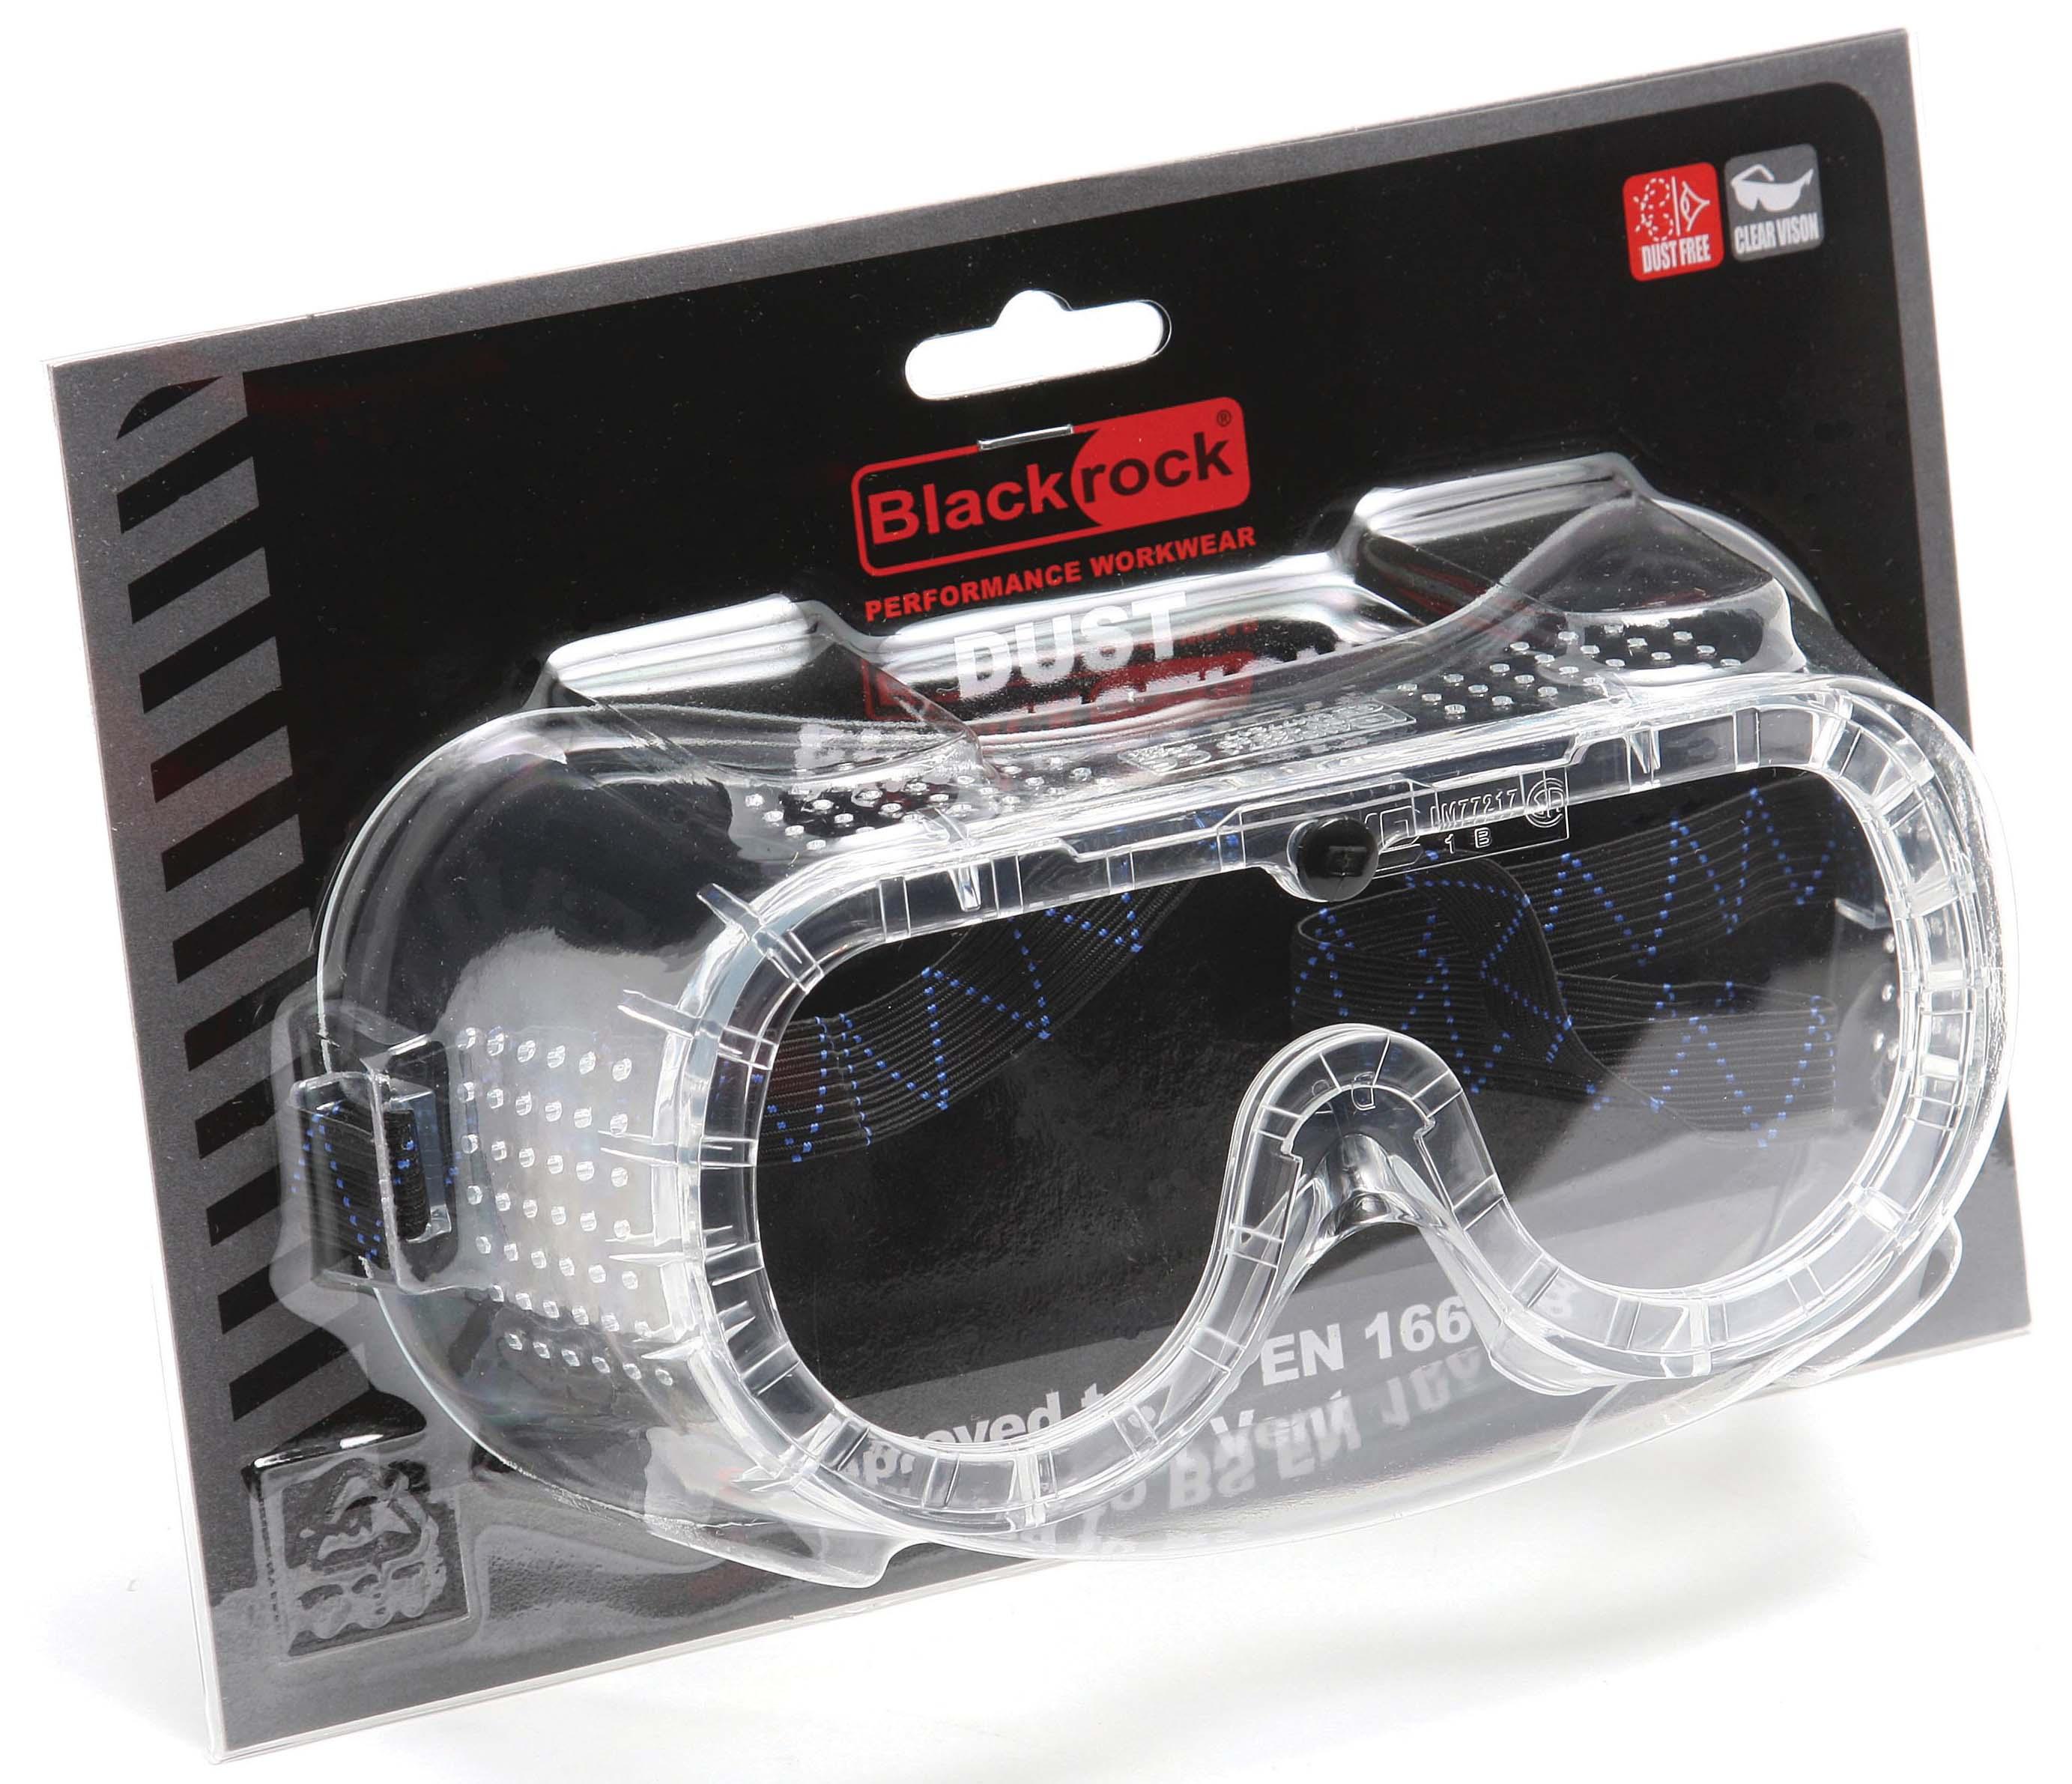 Basic Safety Goggles